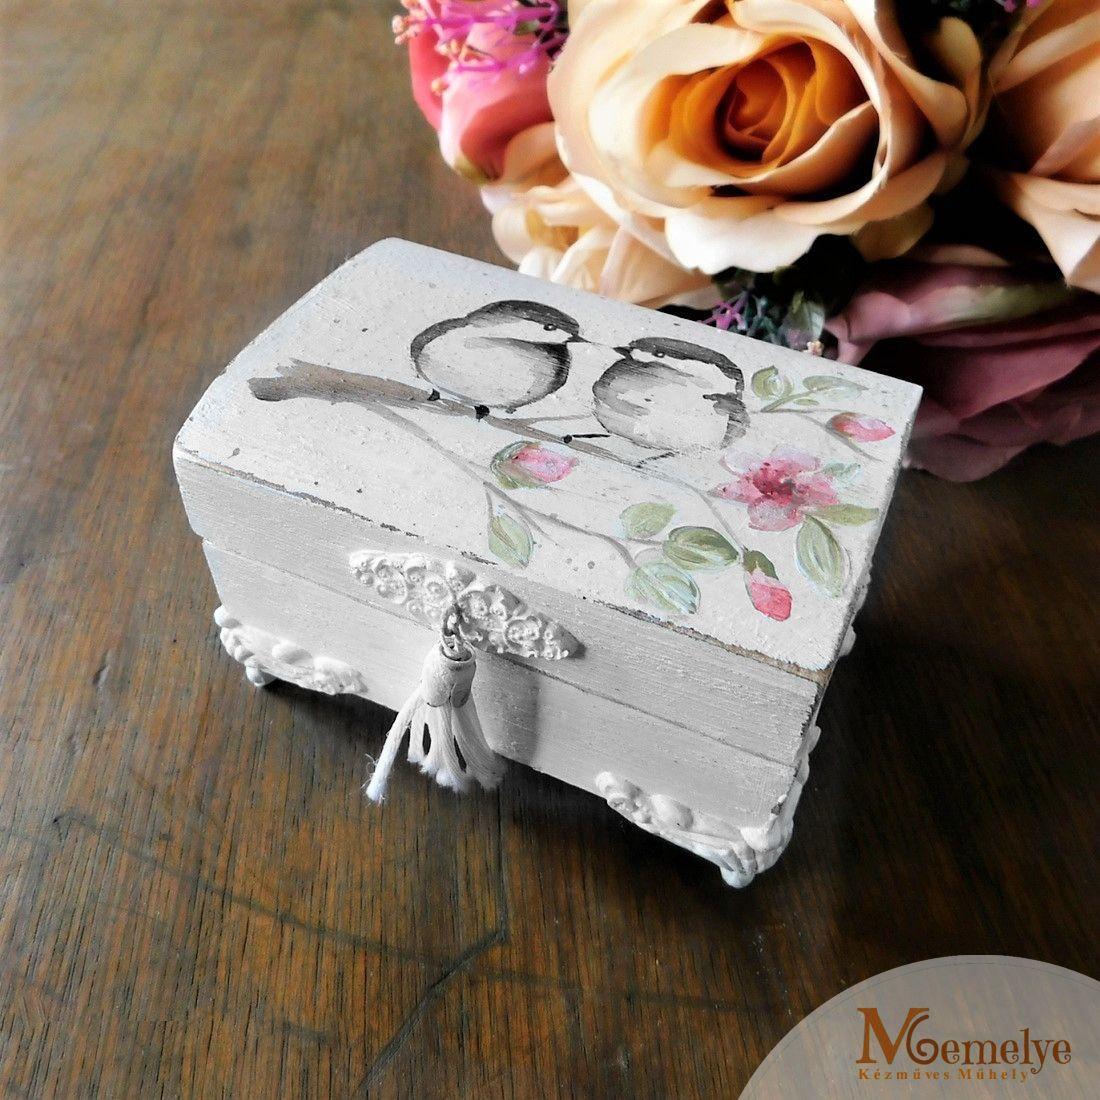 Esküvői gyűrűtartó doboz